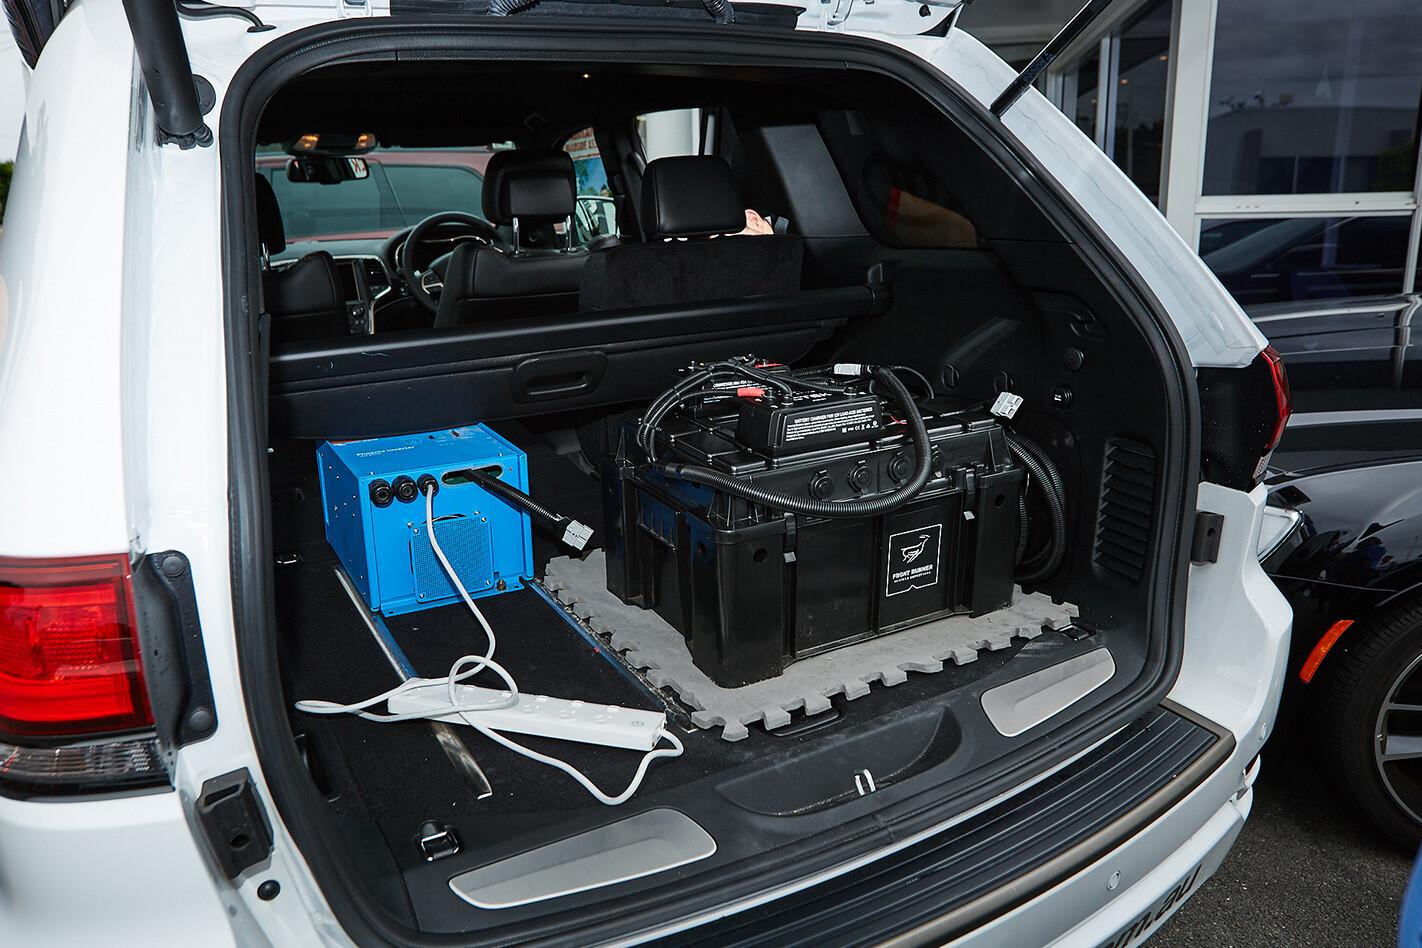 2017 Jeep Grand Cherokee  boot